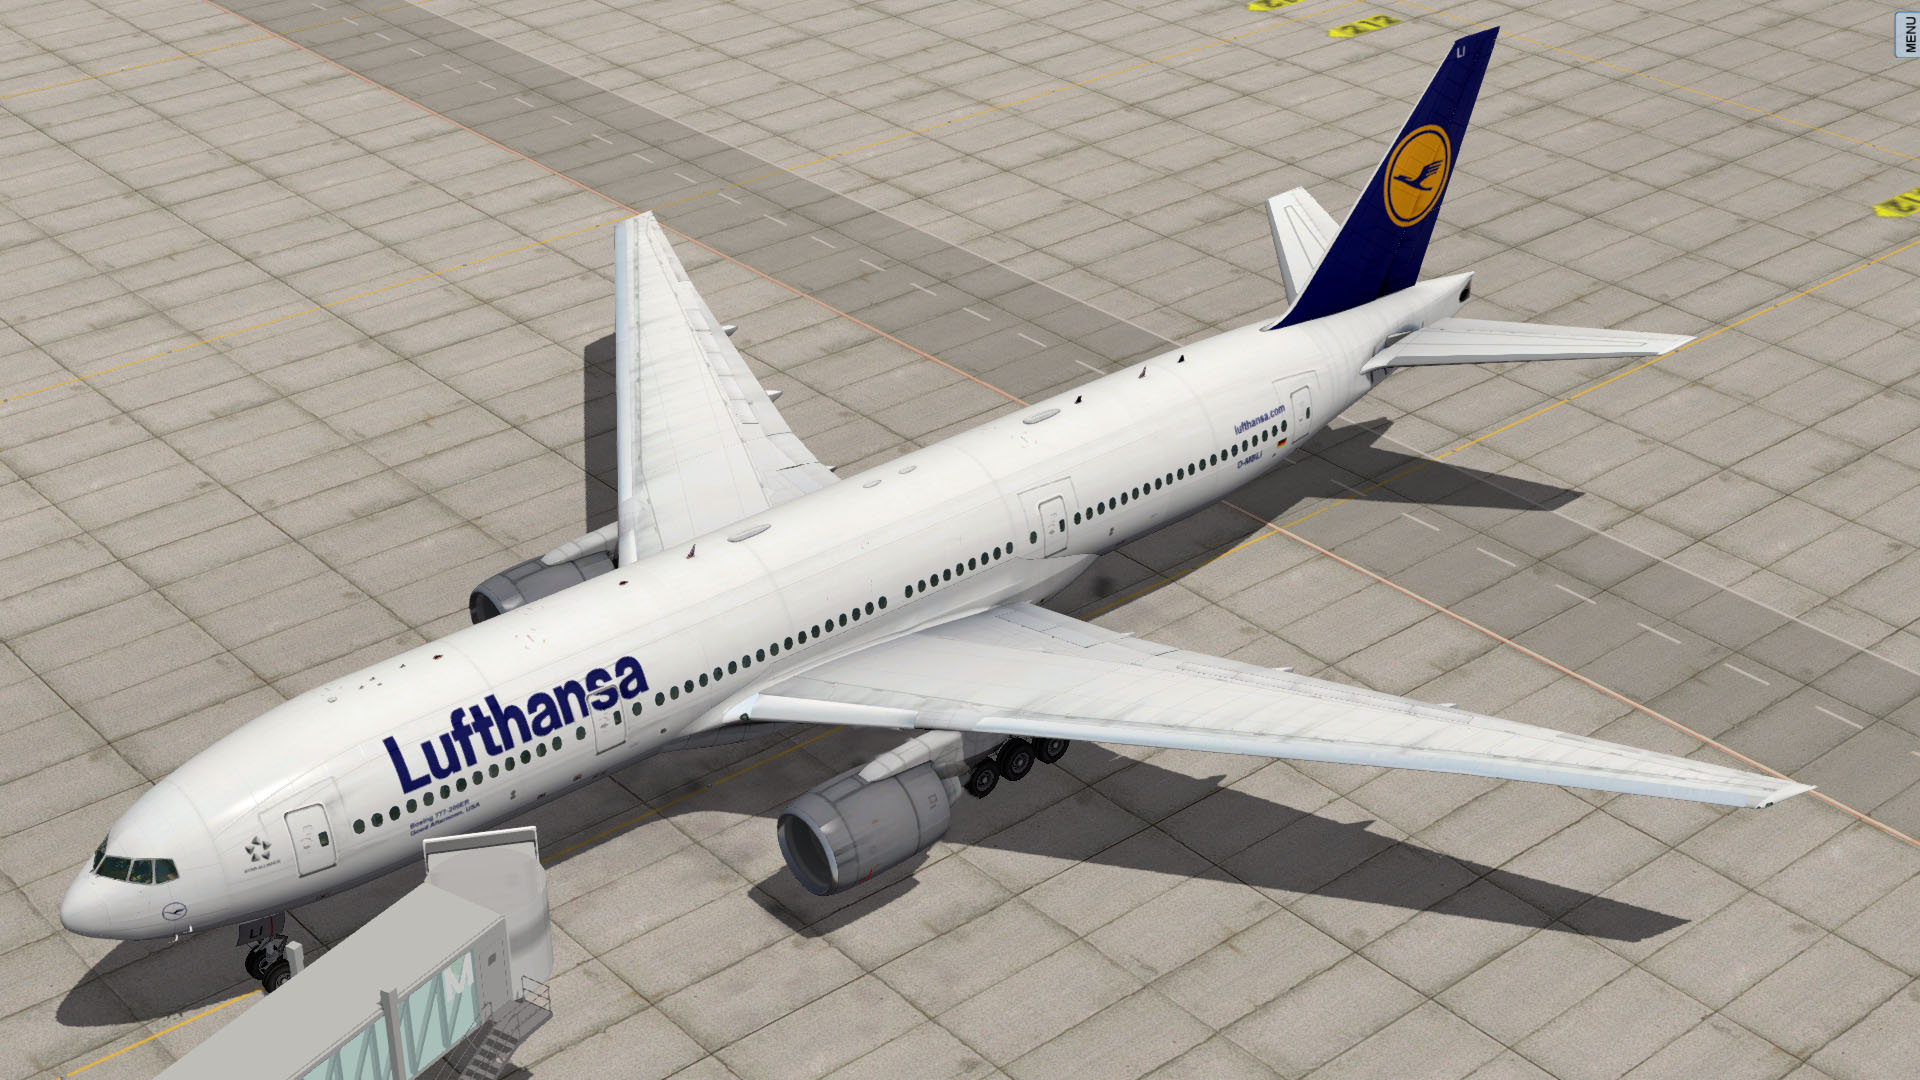 X Plane 11 Freeware 777